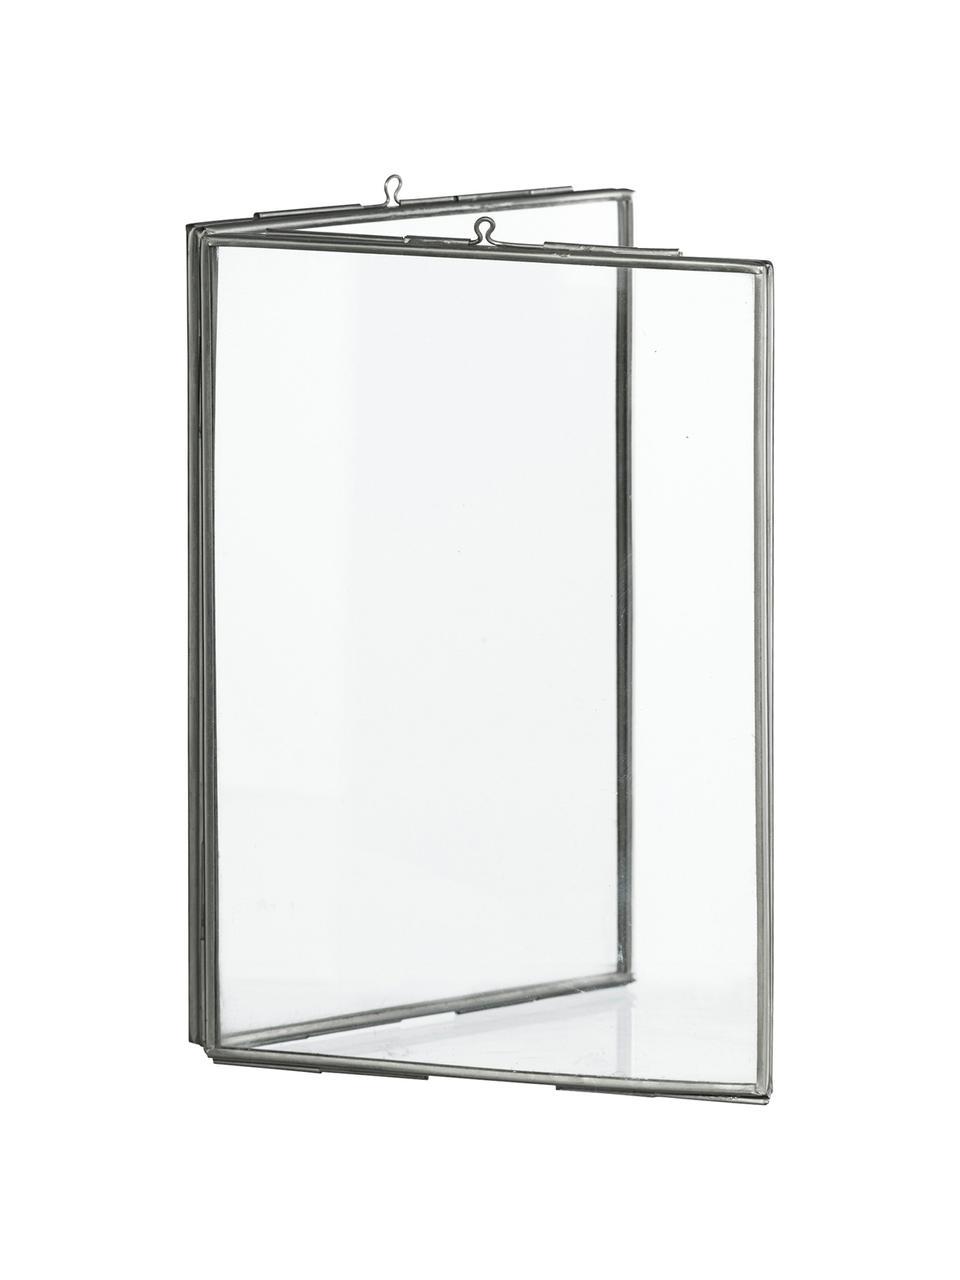 Bilderrahmen Double, Glas, Metall, beschichtet, Edelstahl, 10 x 15